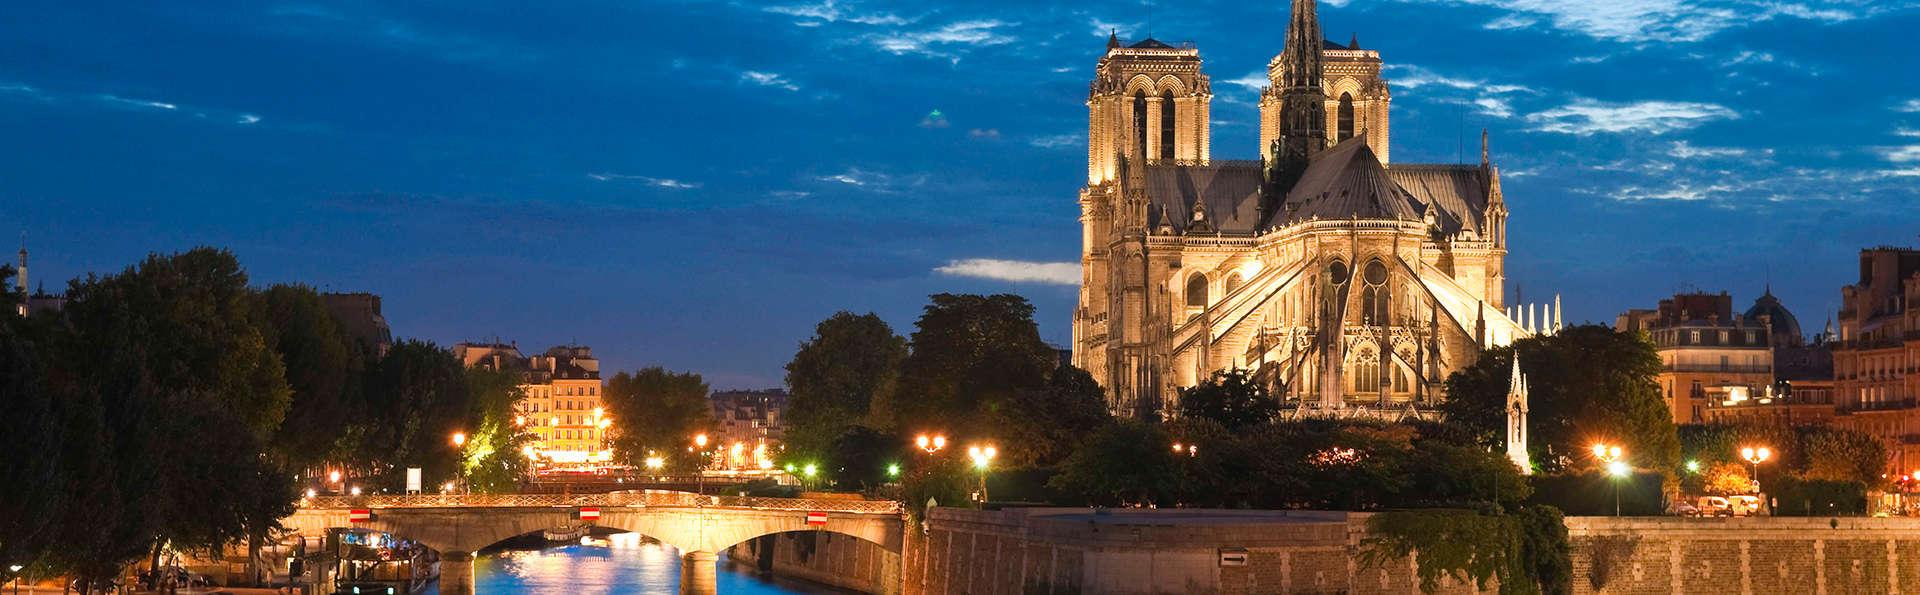 Le Mareuil - EDIT_paris4.jpg